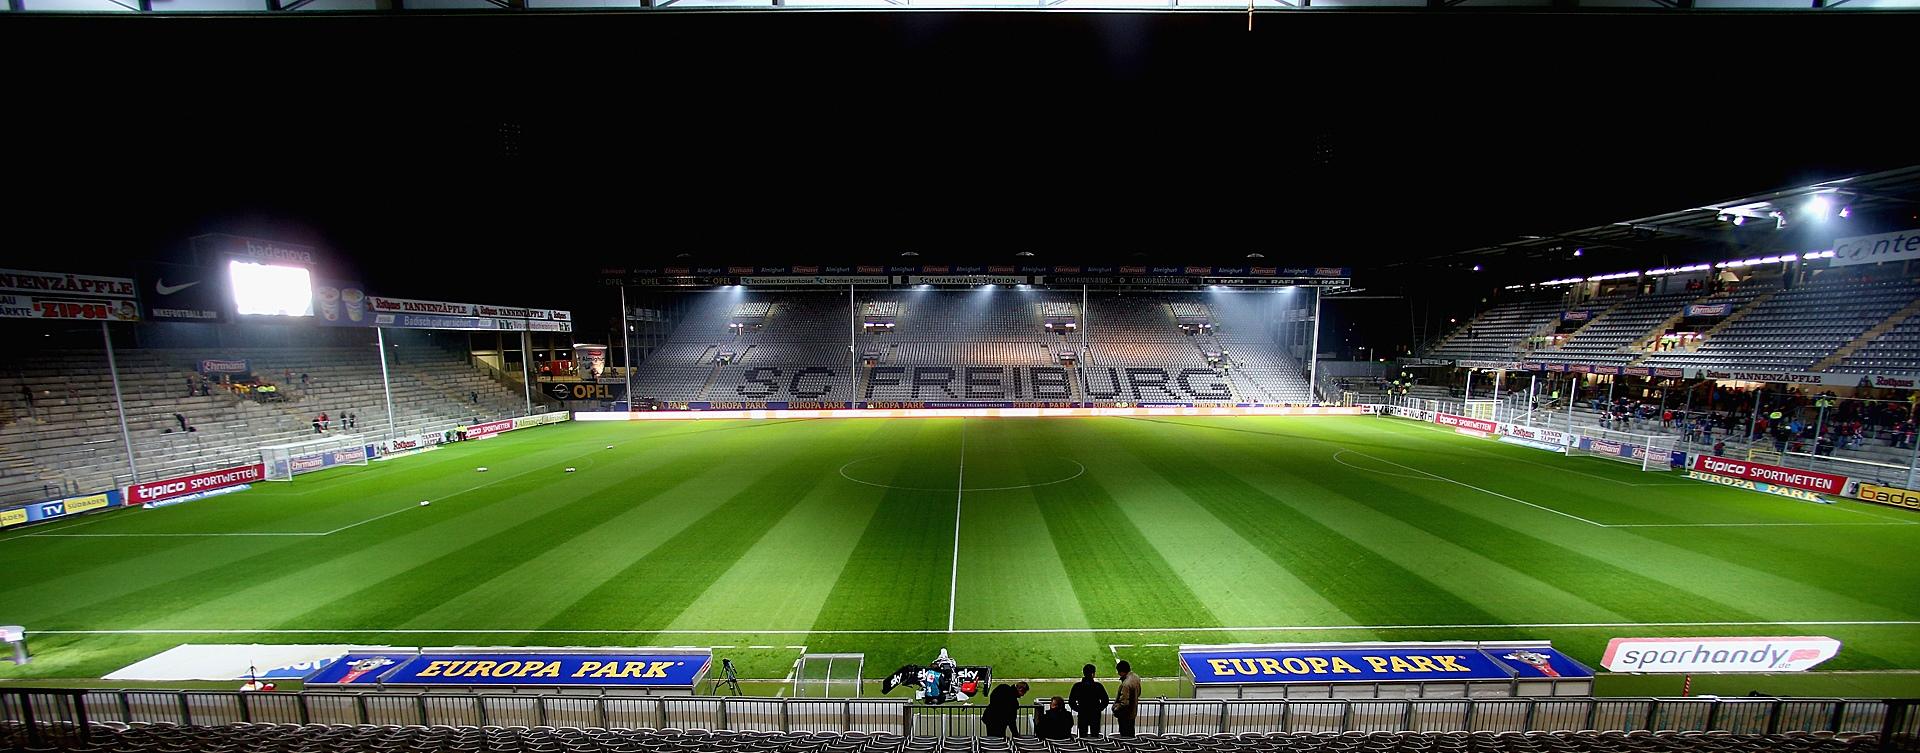 Sc Freiburg Karten.Sc Freiburg Vs Fc Augsburg 21 09 2019 Football Ticket Net